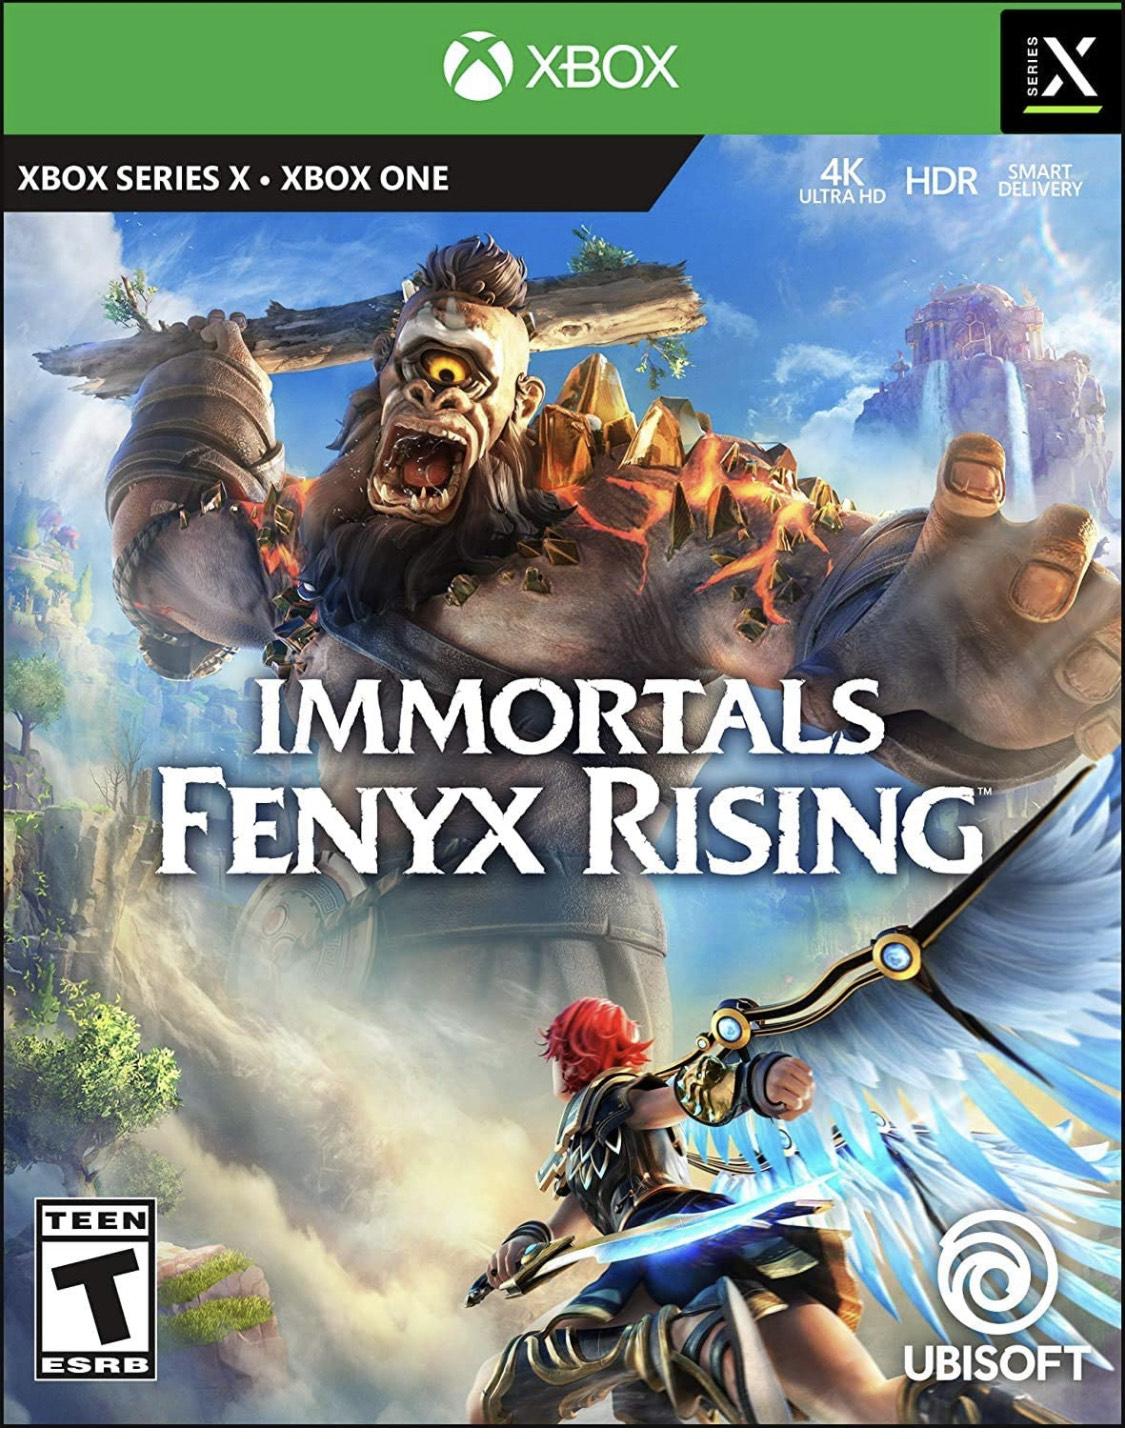 Amazon: Immortals Fenyx Rising - Xbox One - Standard Edition